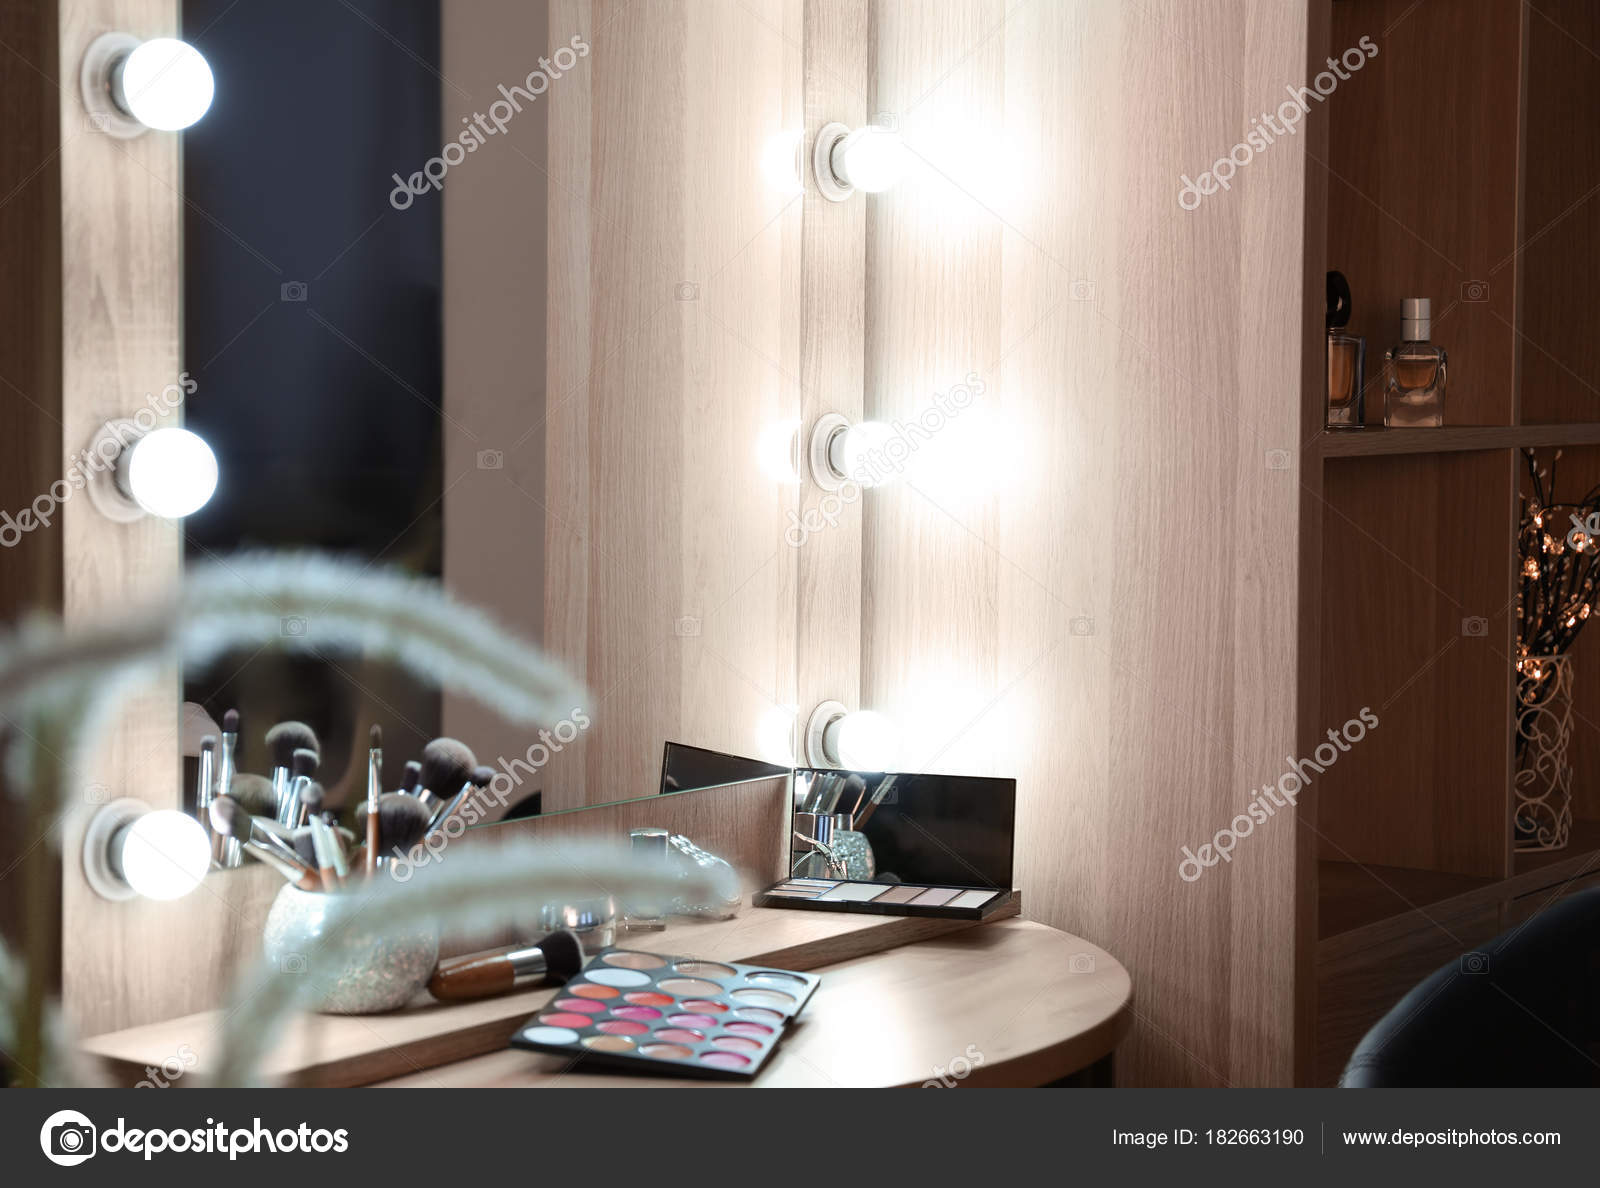 Betere Spiegel Met Lampen Moderne Make Kamer — Stockfoto © belchonock ED-93